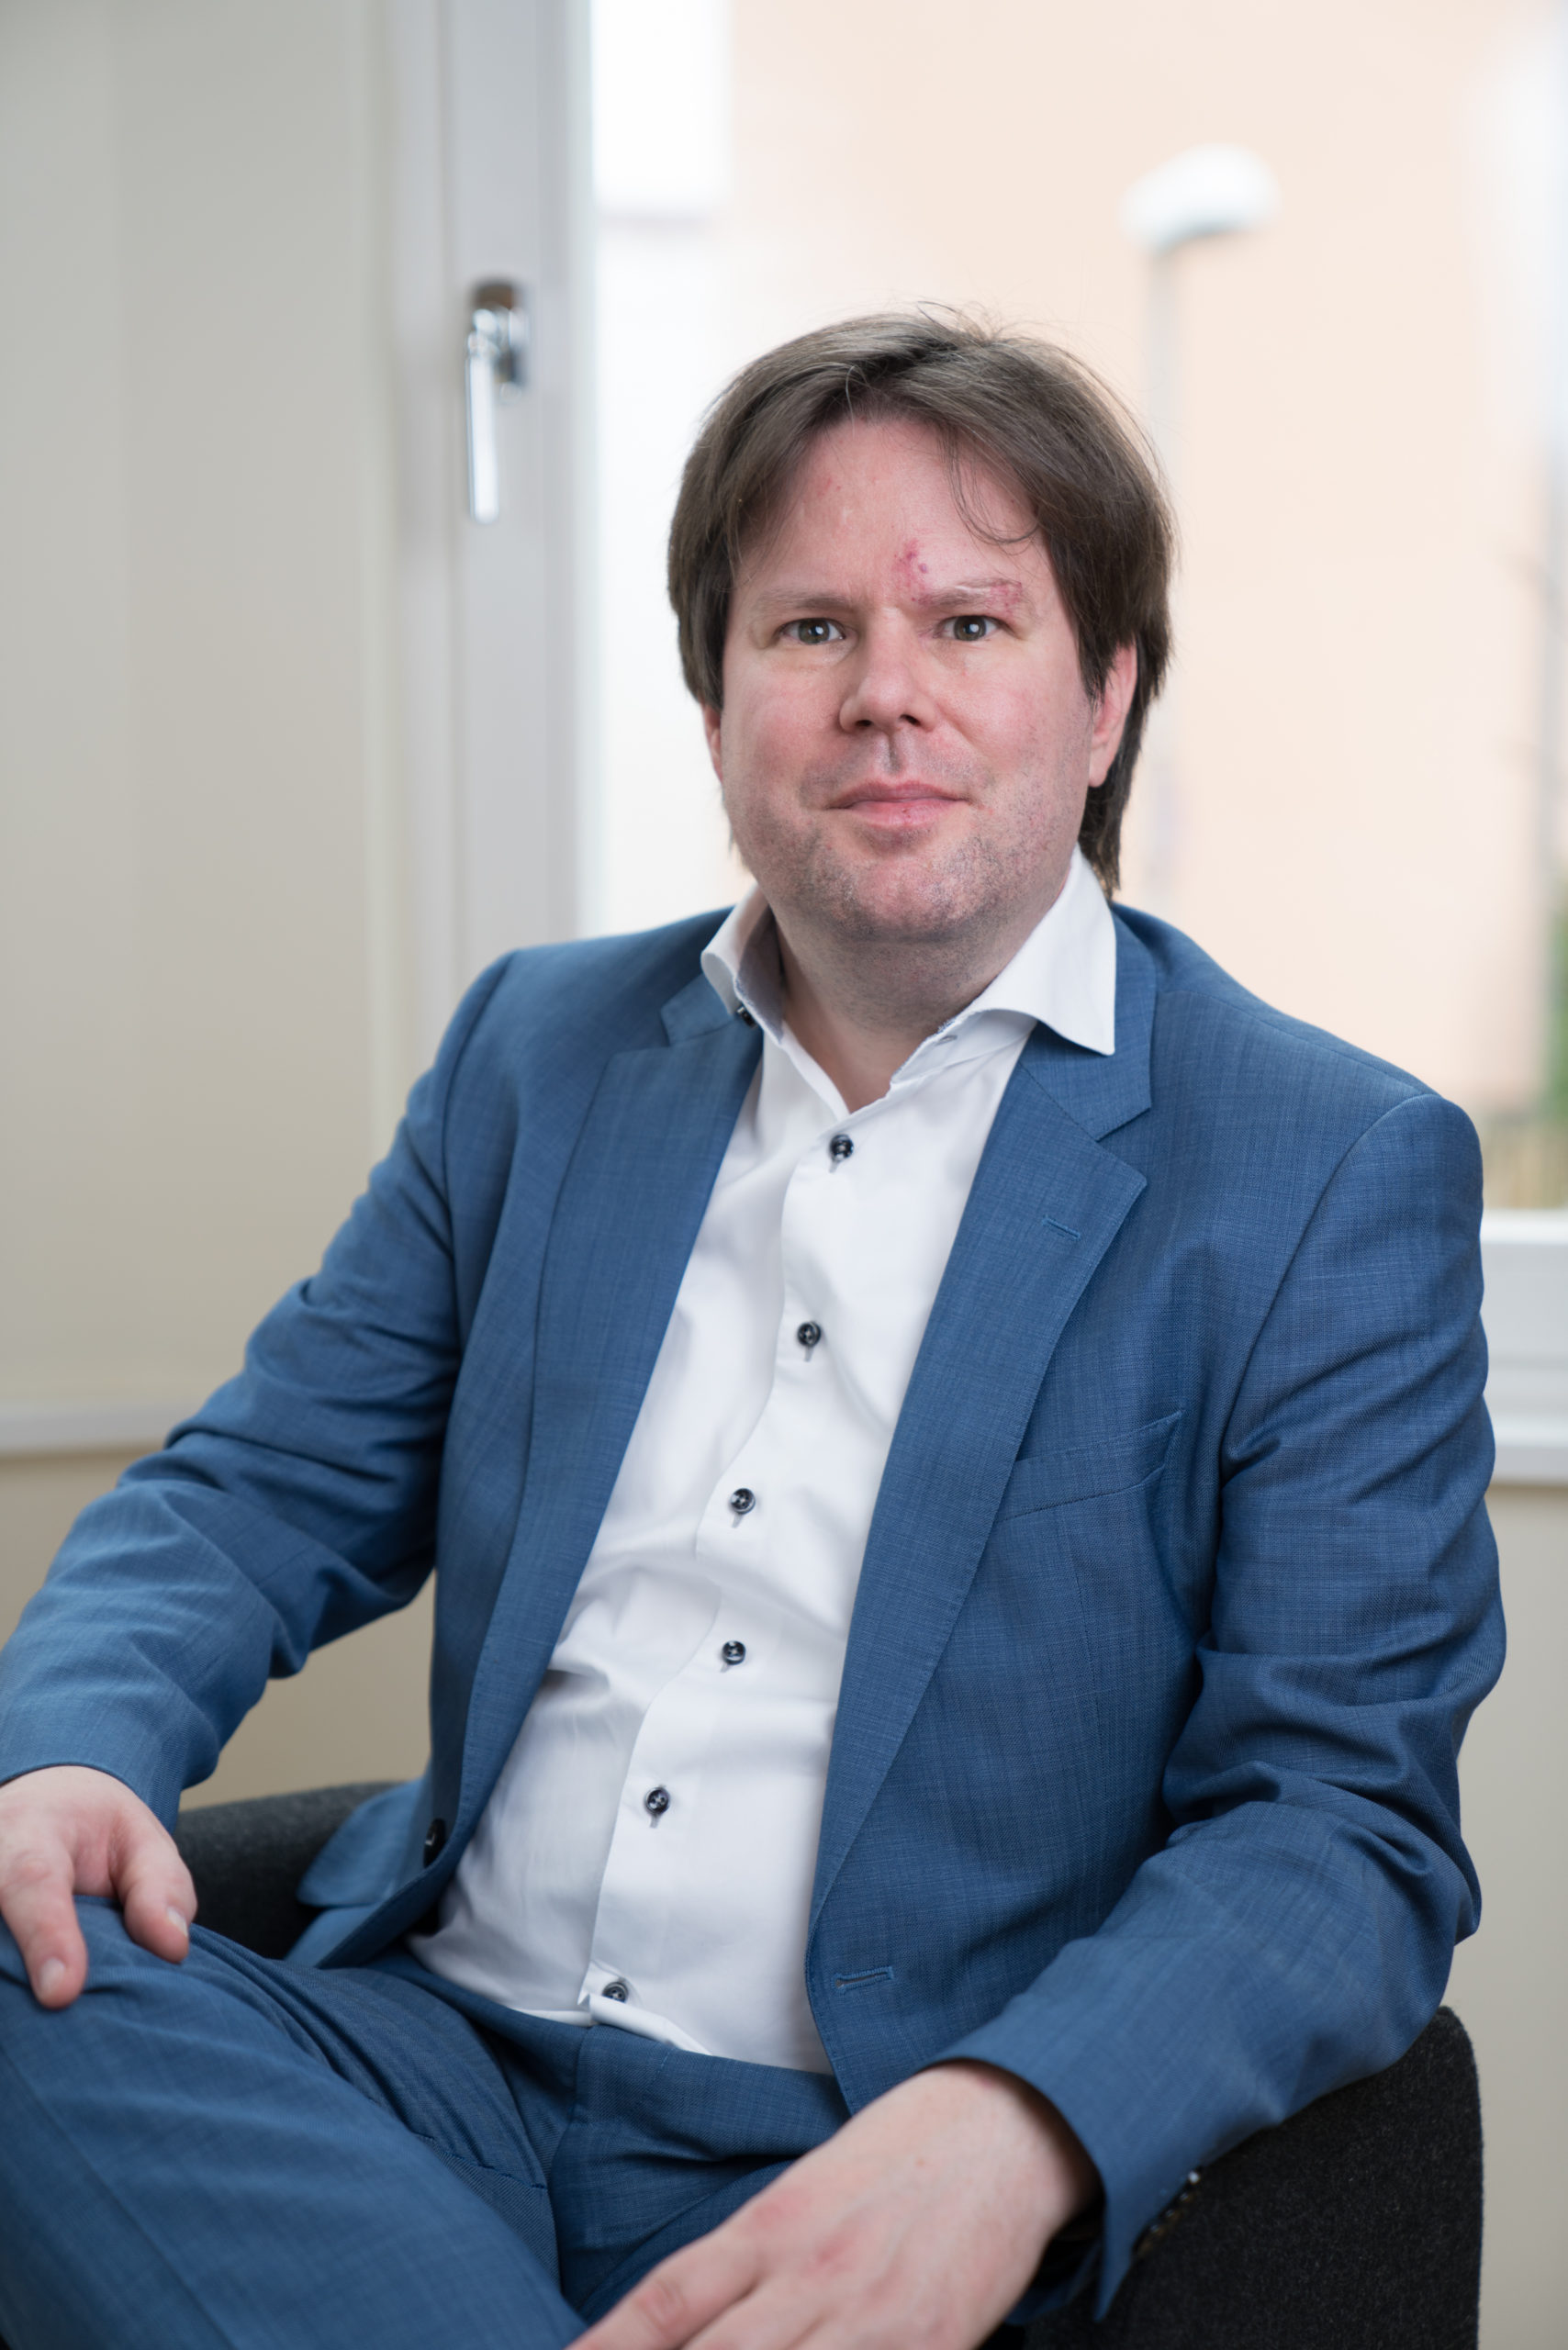 Dr. Steffen Helbing